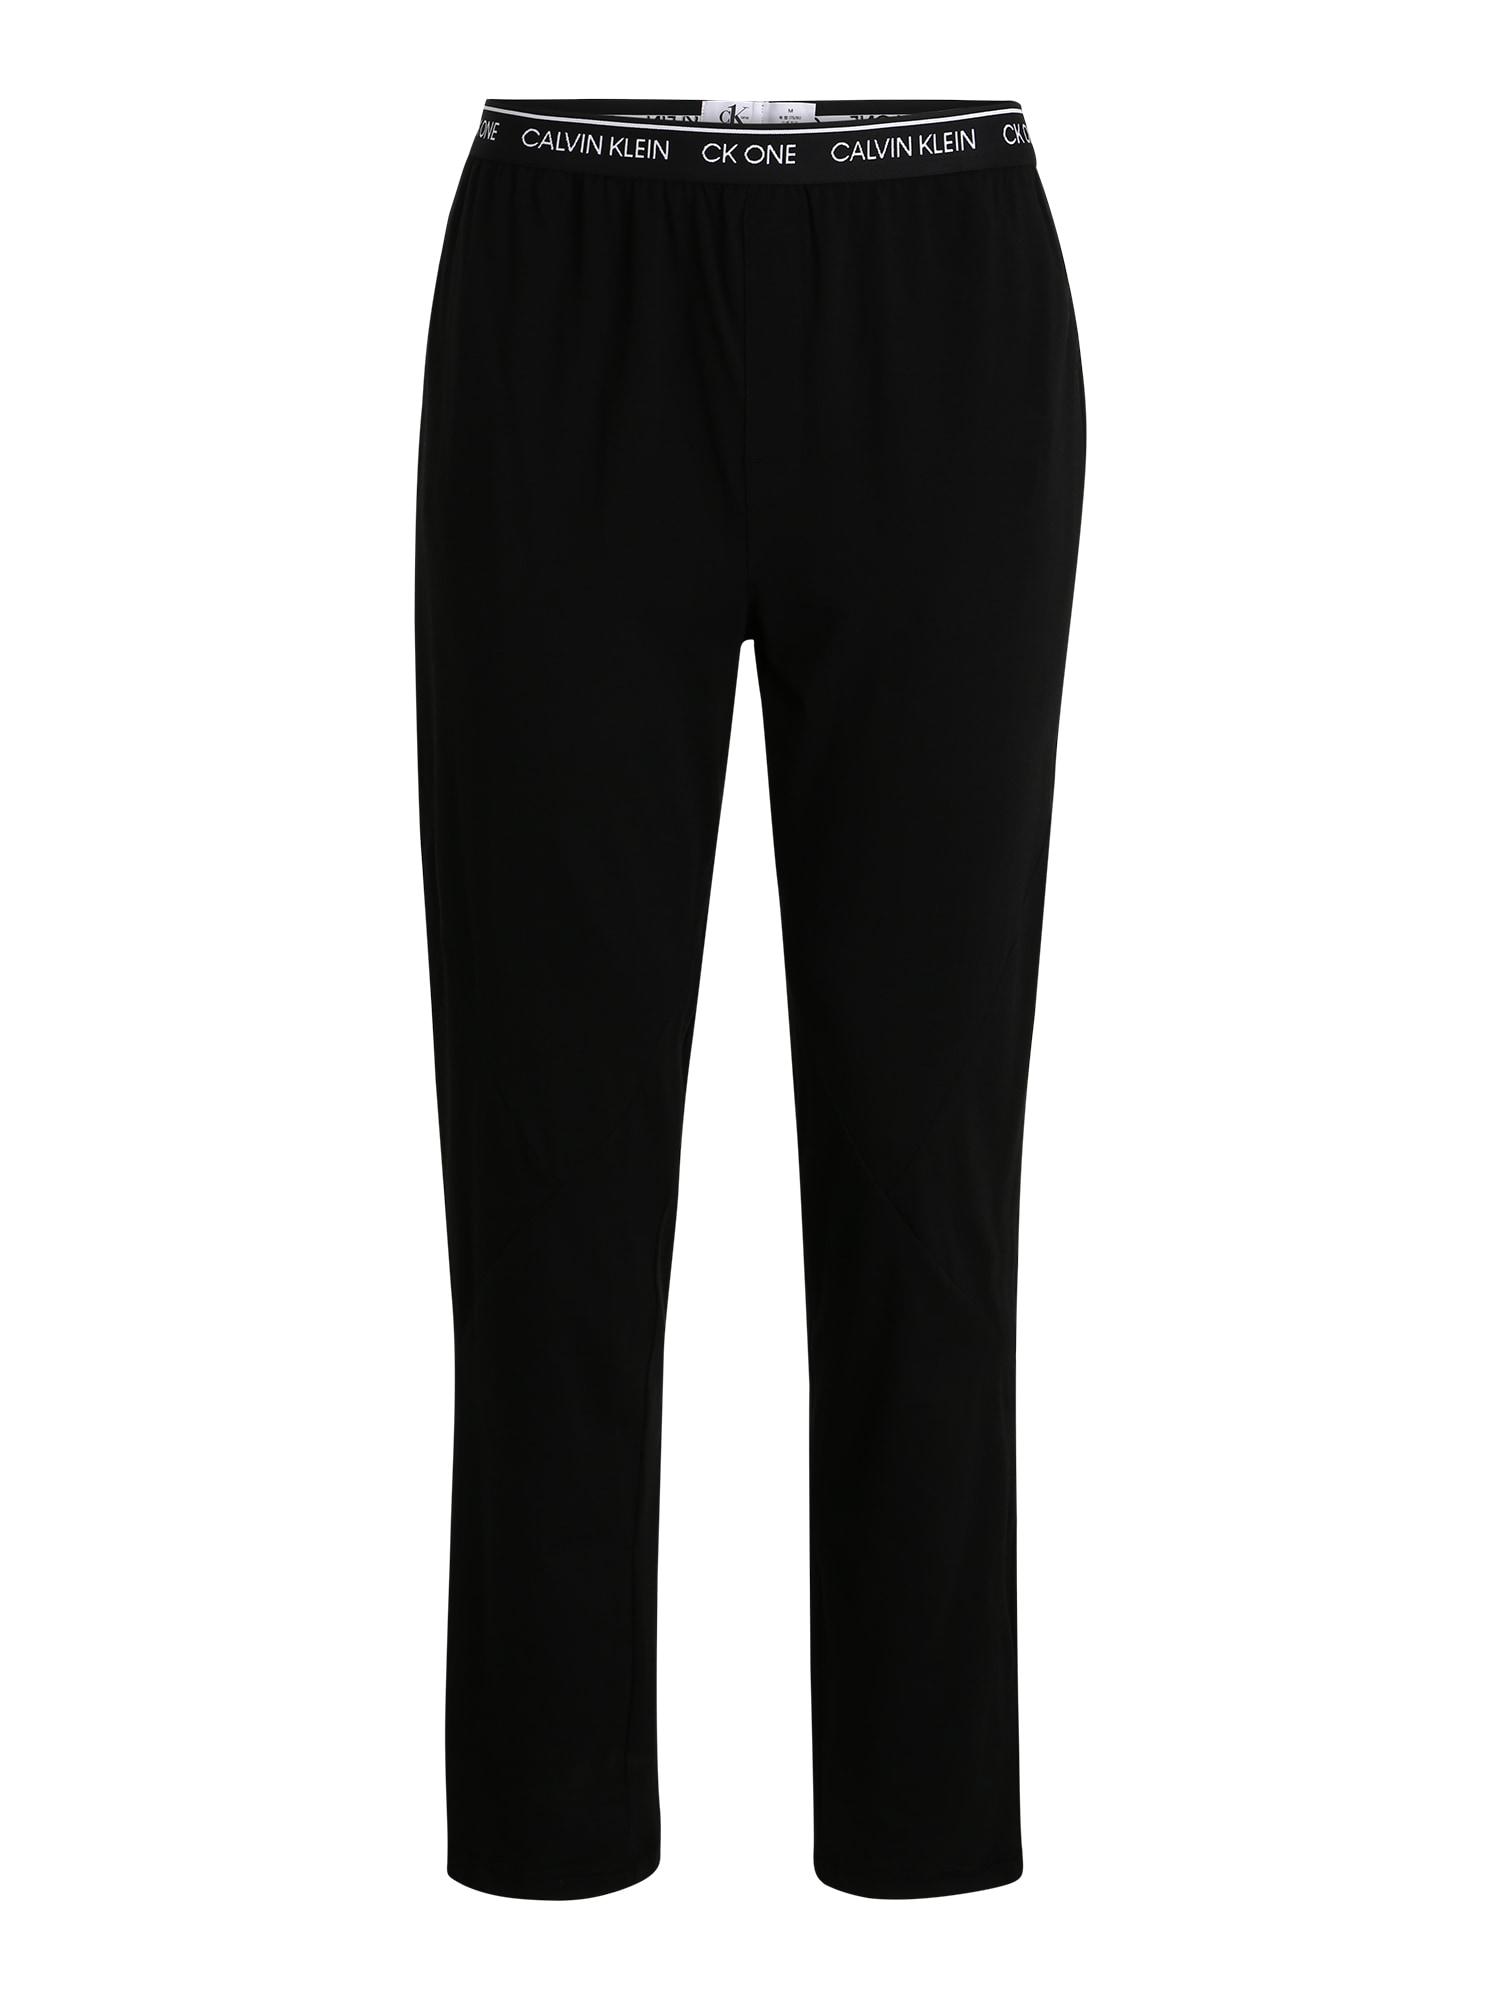 Calvin Klein Underwear Pižaminės kelnės